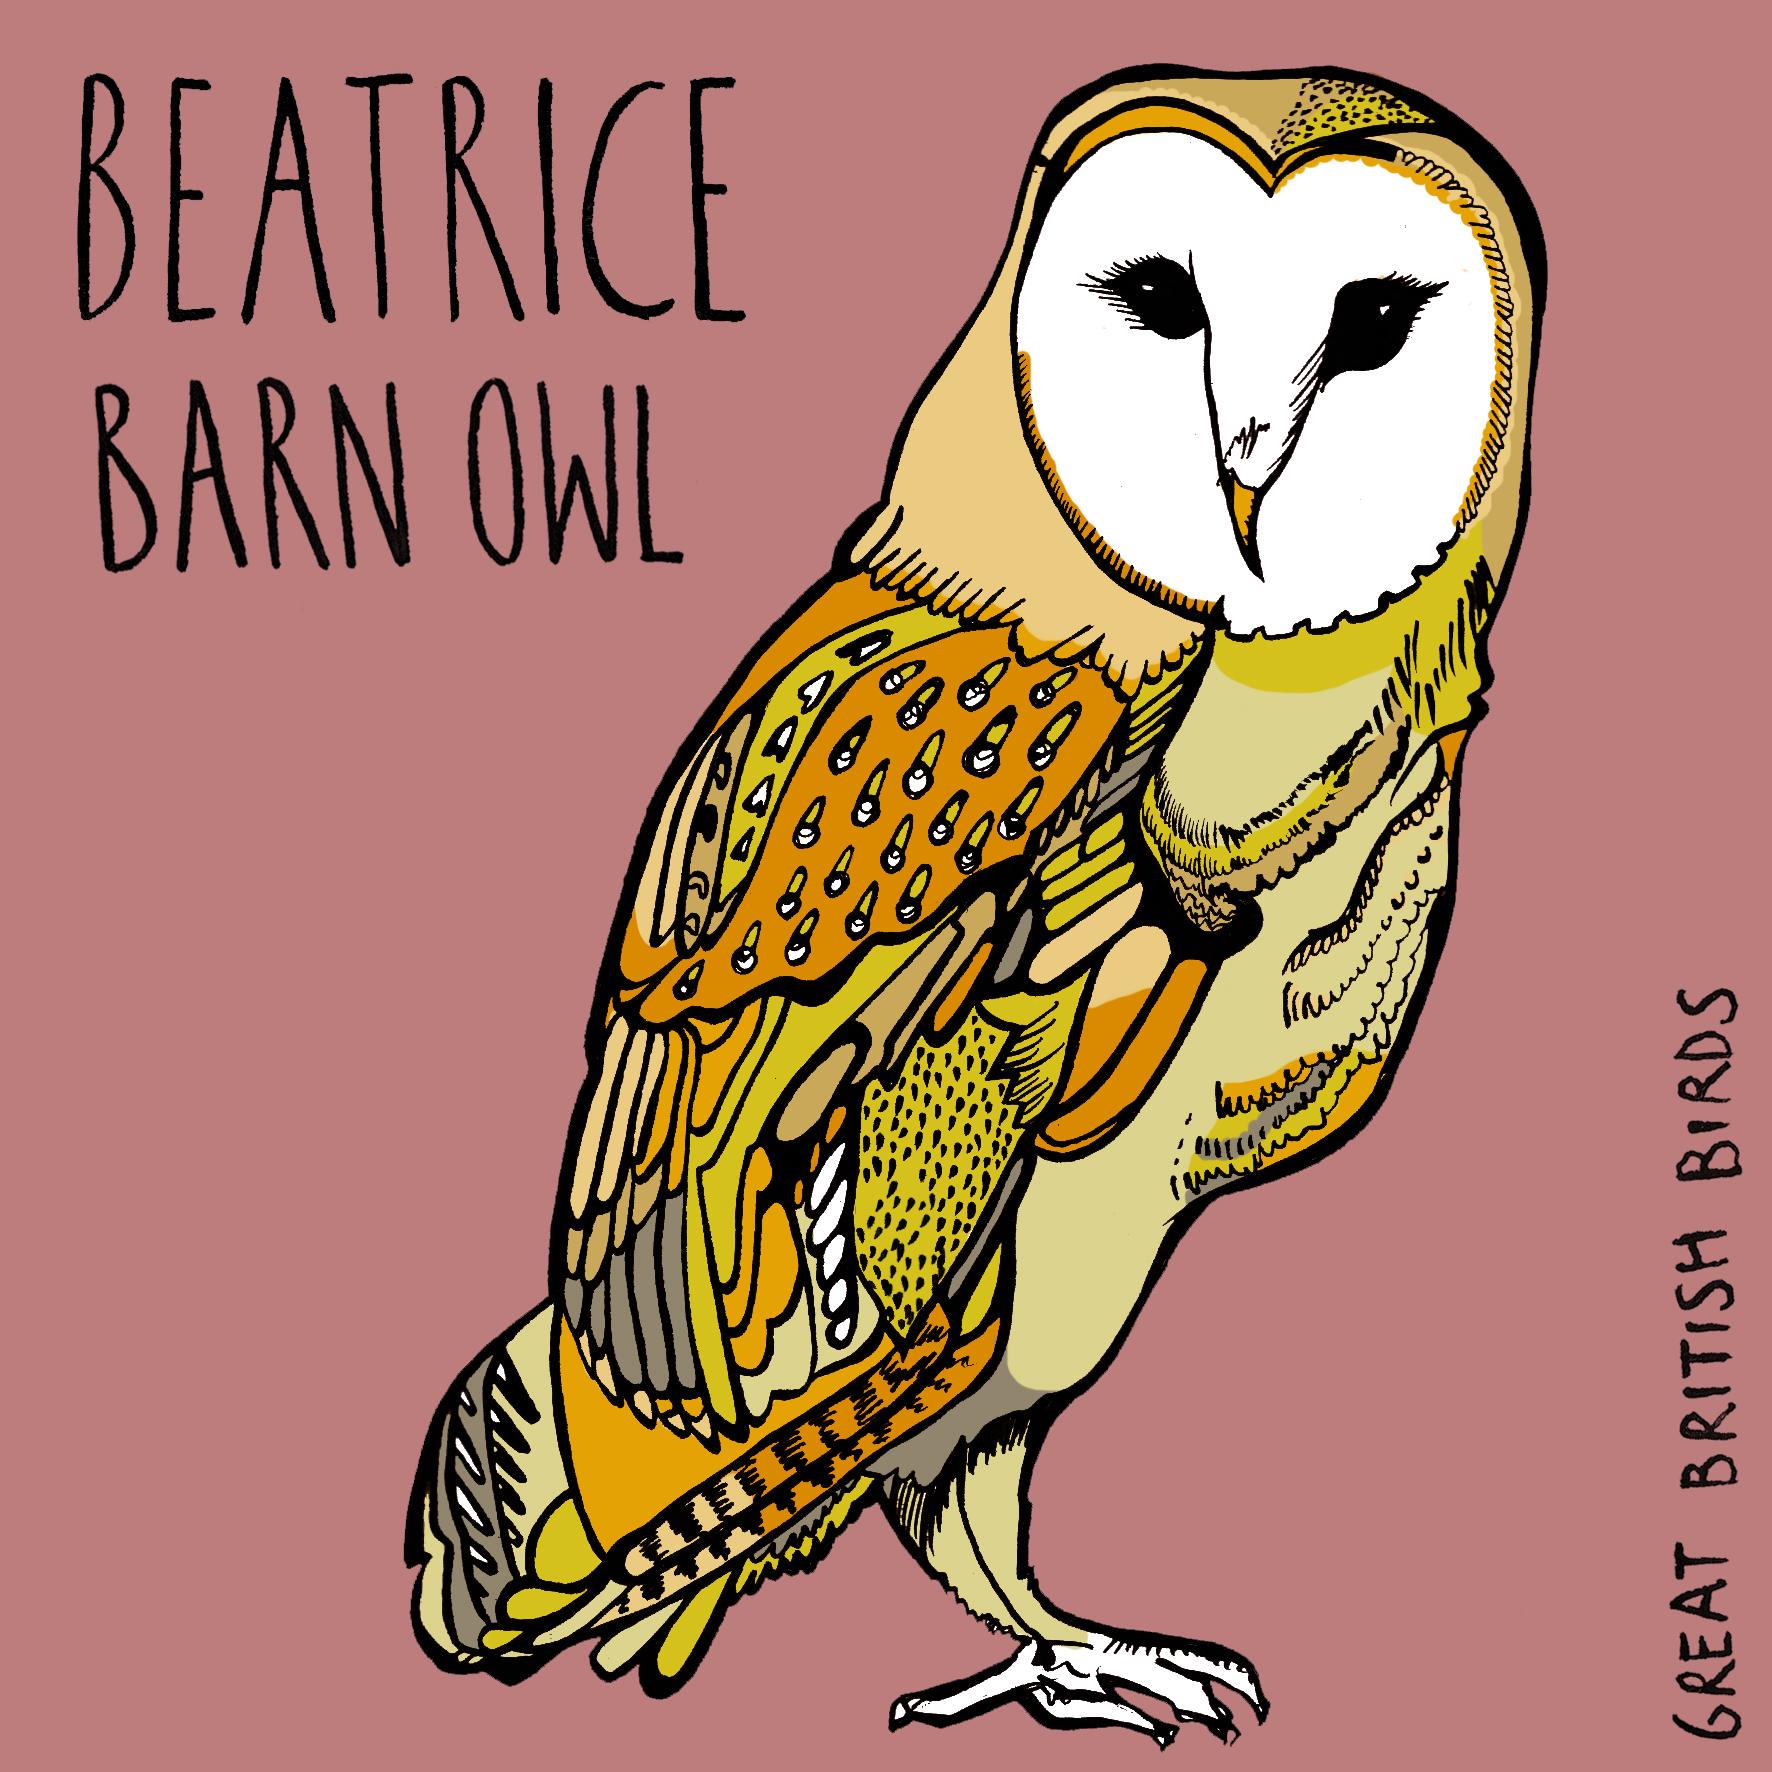 Beatrice Barn Owl.jpg